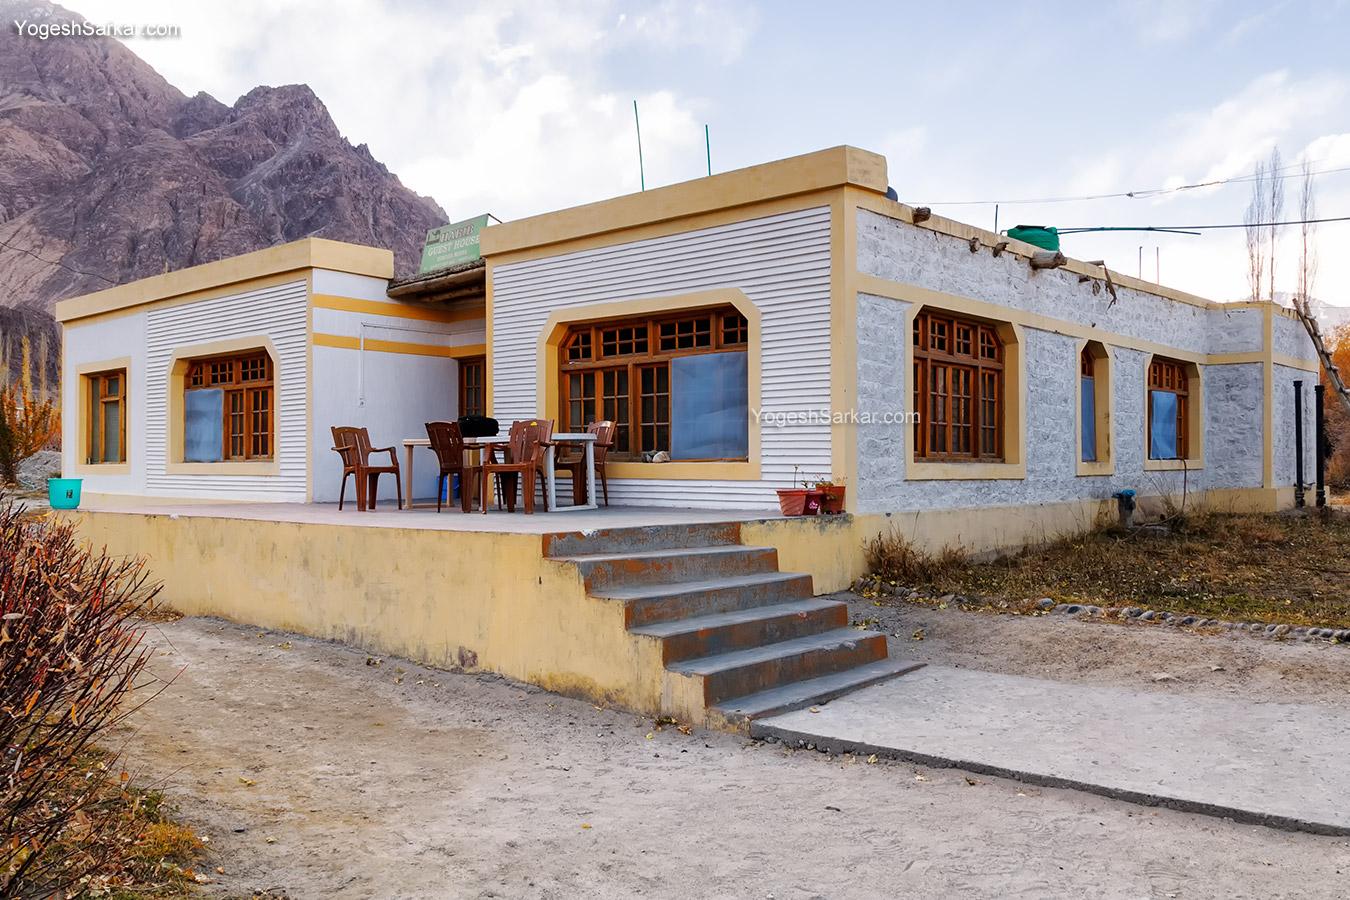 habib-guest-house-humder-nubra-valley.jpg